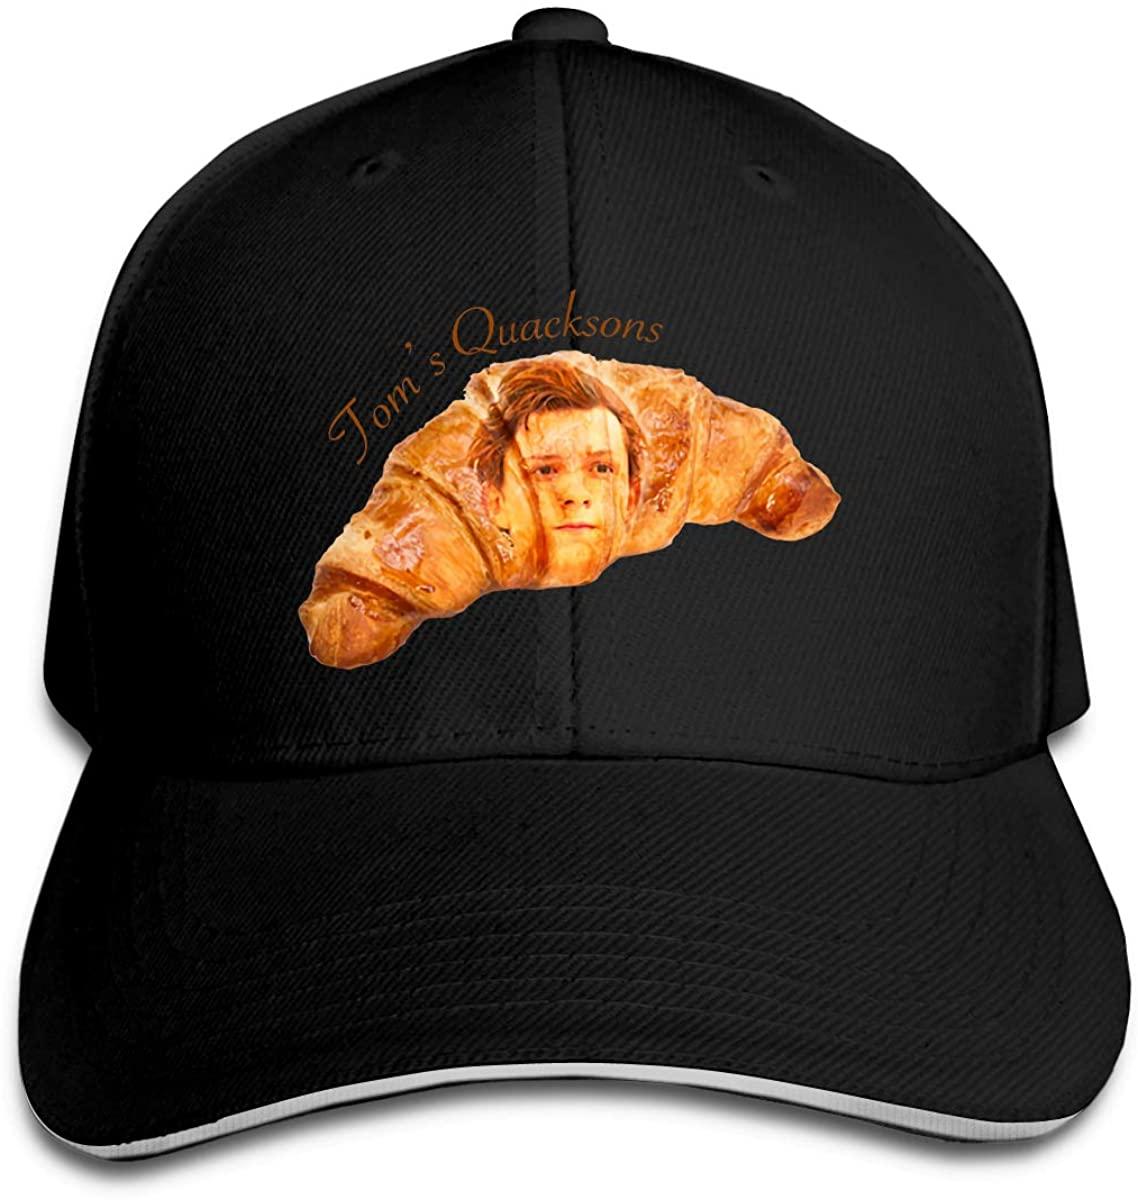 Tom Holland Quacksons Sandwich Baseball Cap Hip Hop Outdoor Hat Unisex